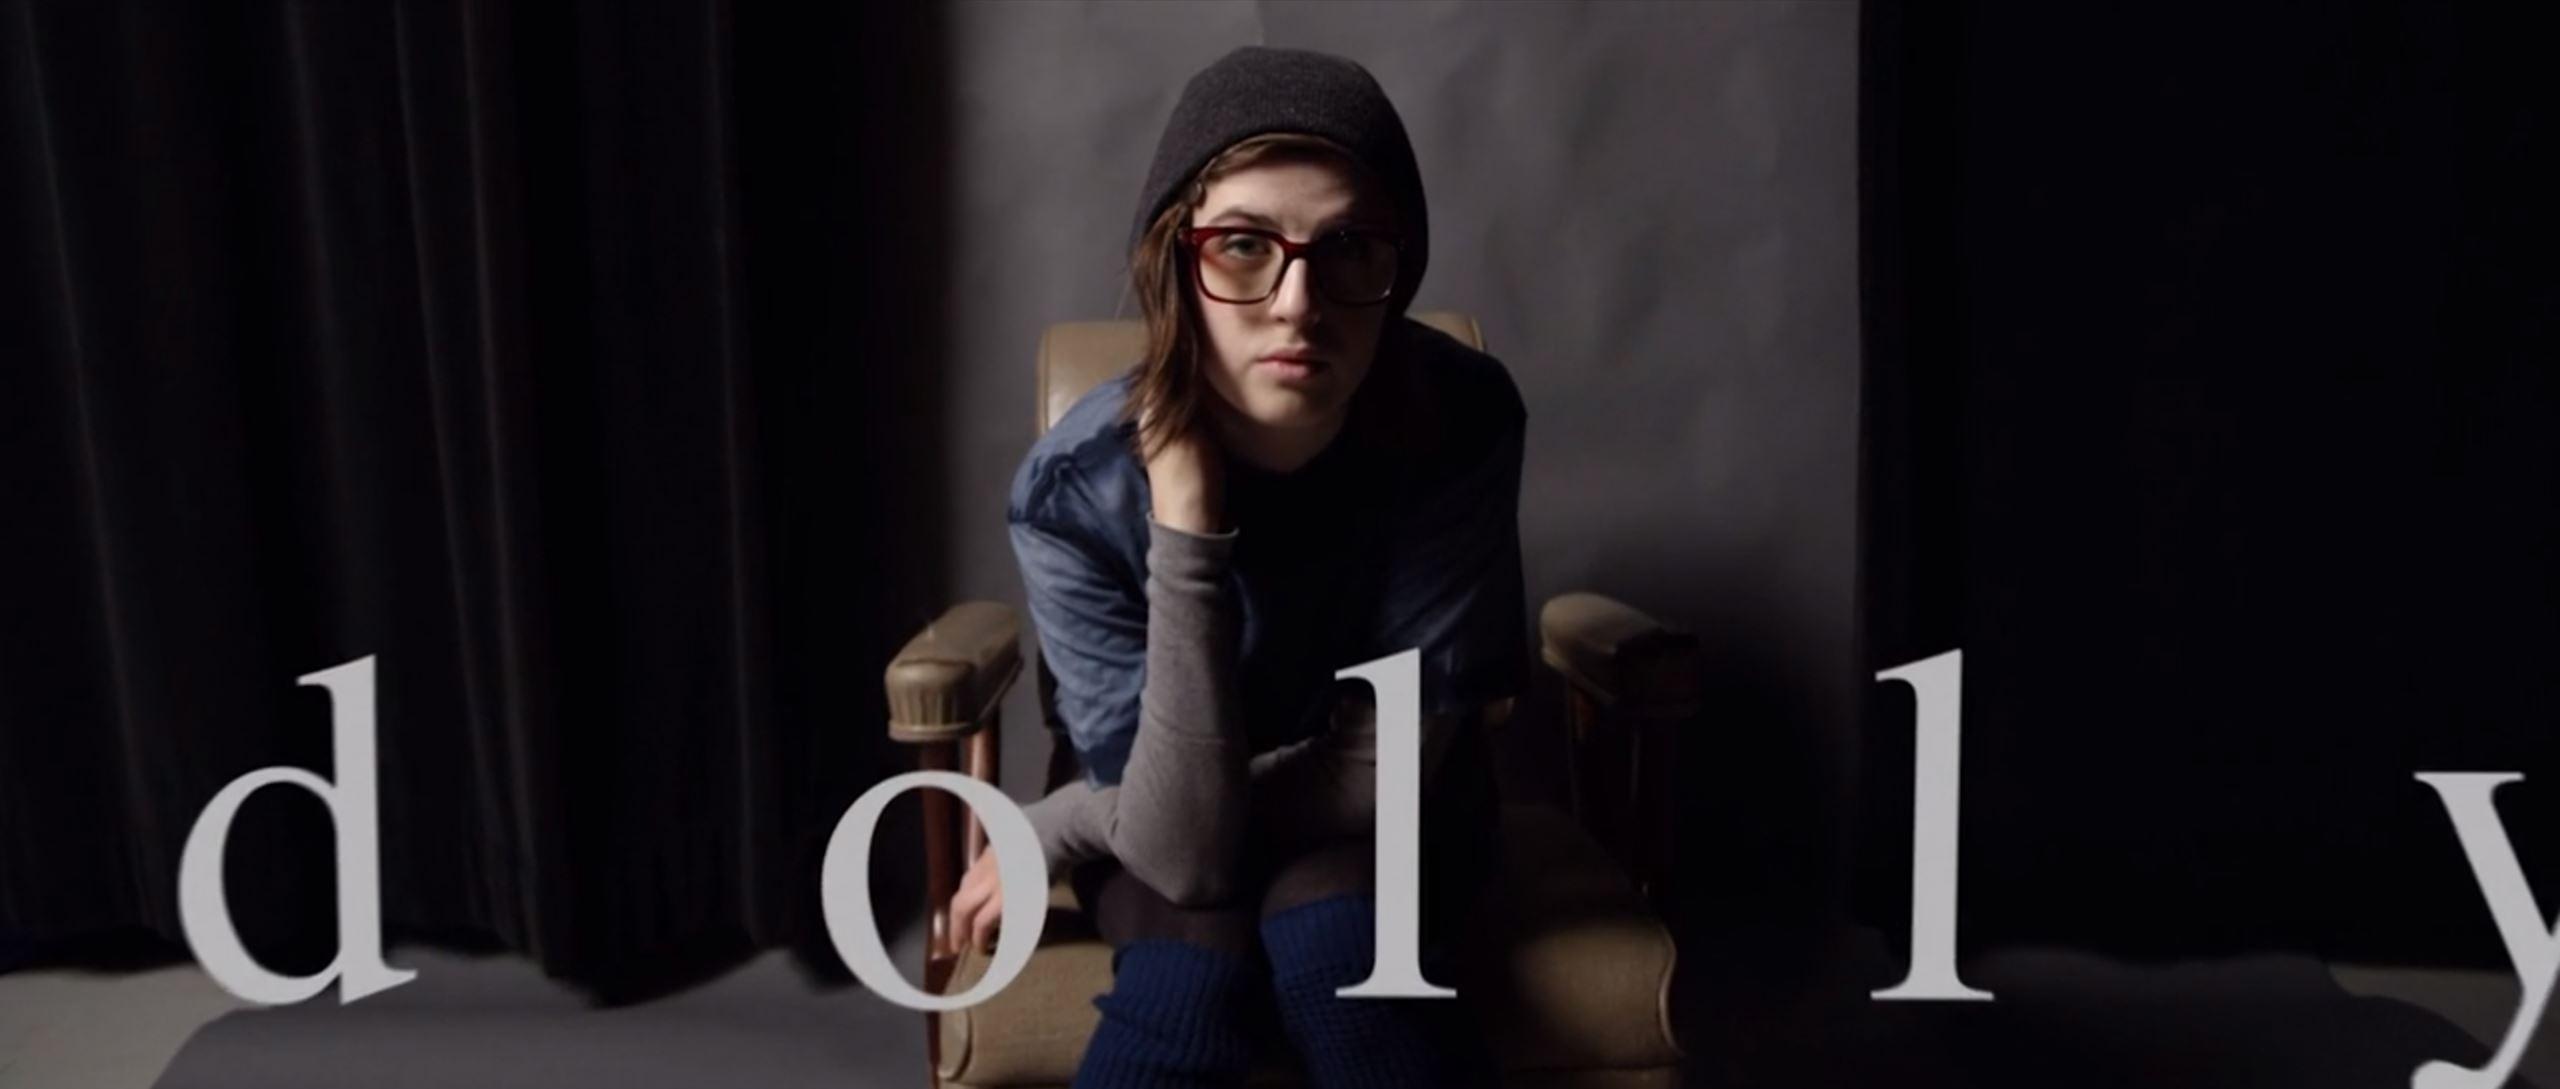 A - Z of Film 02